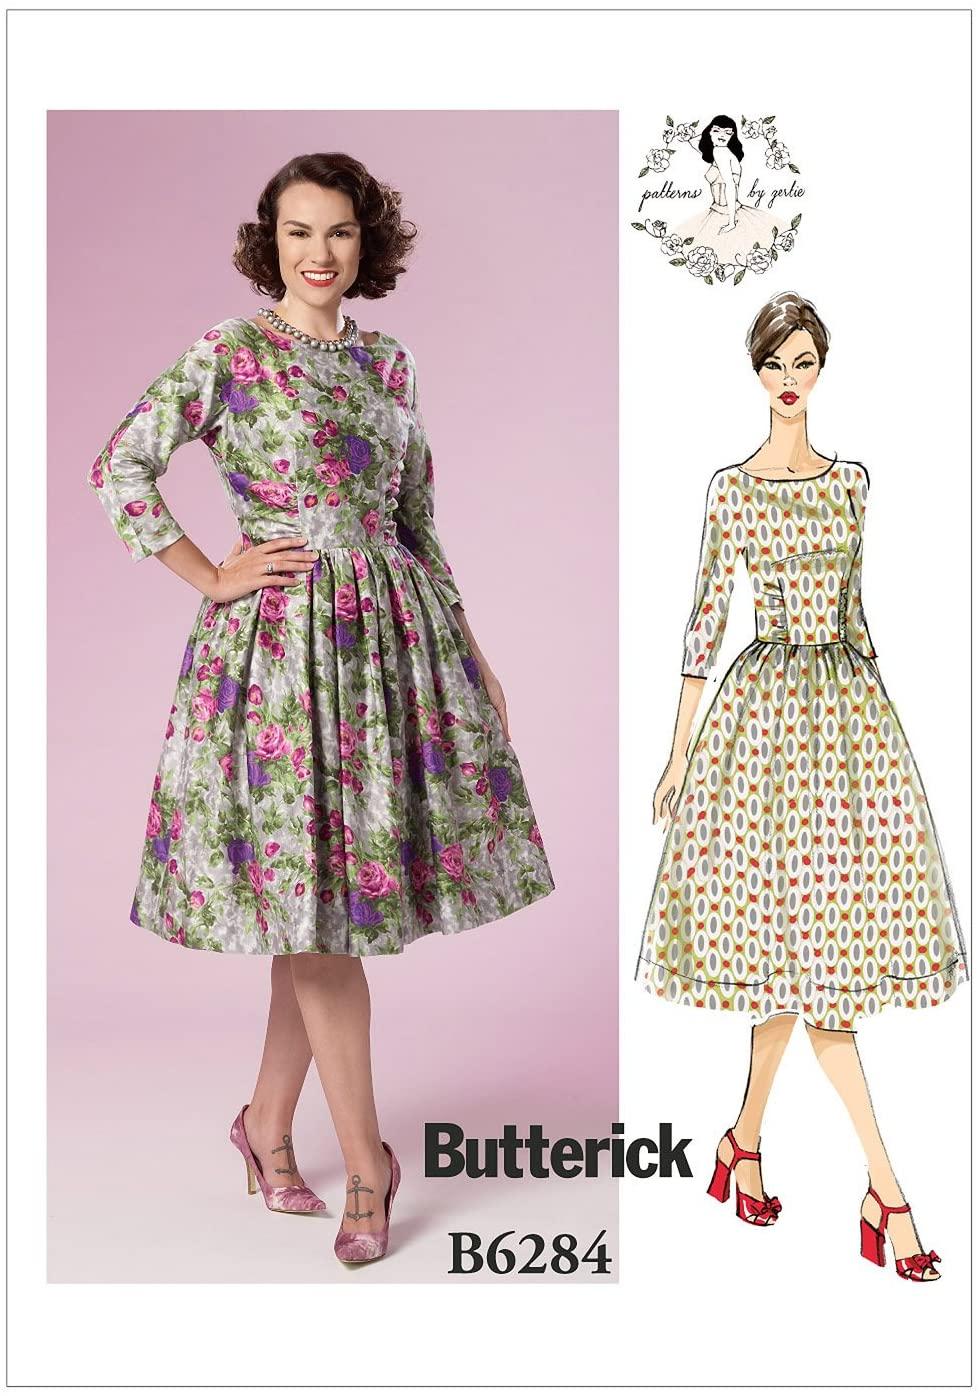 BUTTERICK PATTERNS B6284 Misses' Dress, E5 (14-16-18-20-22)